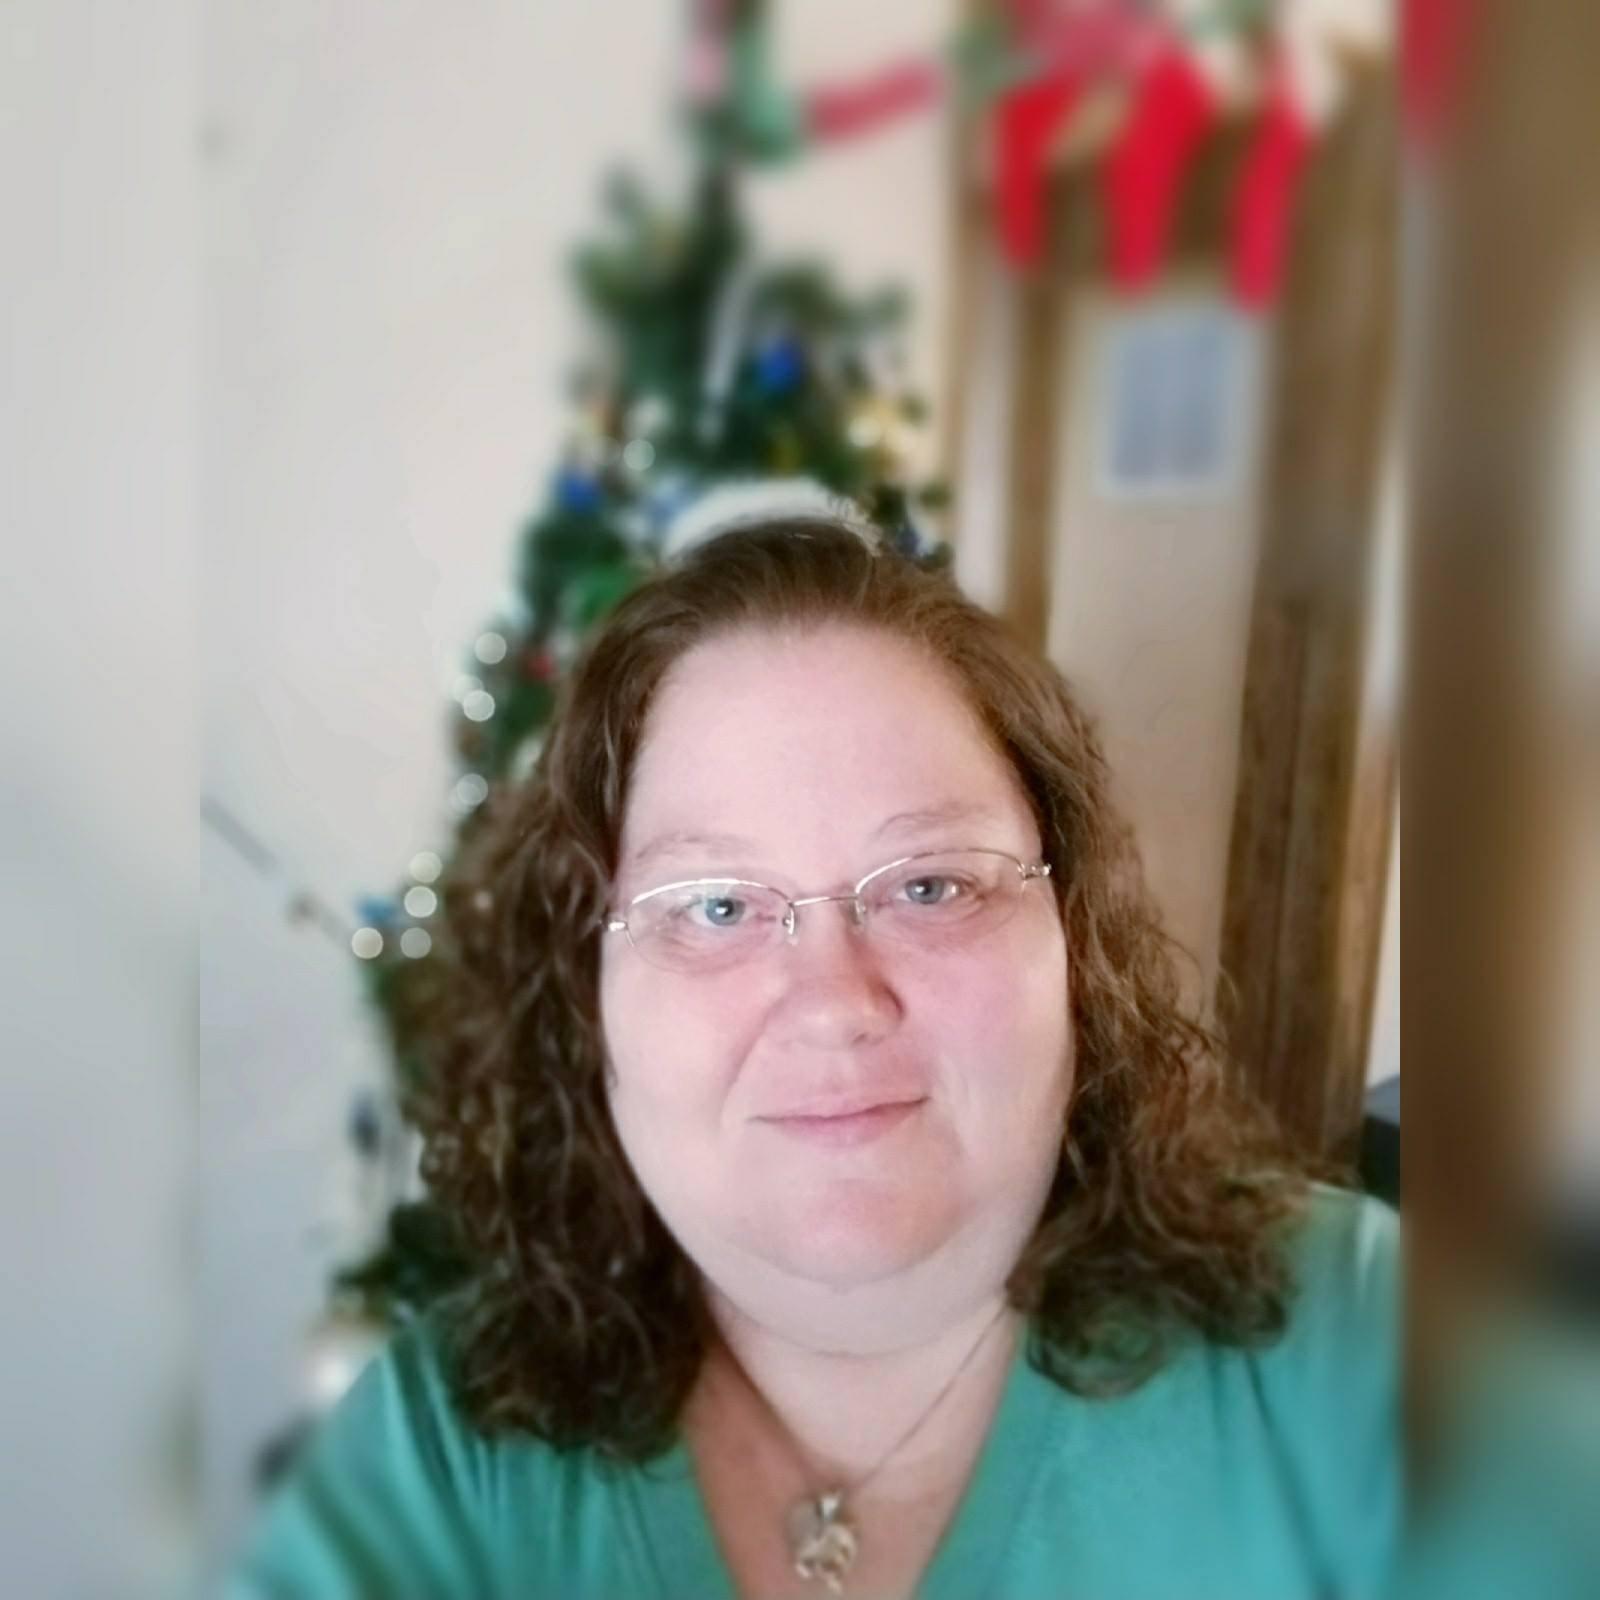 Avatar of user Wendy Miller